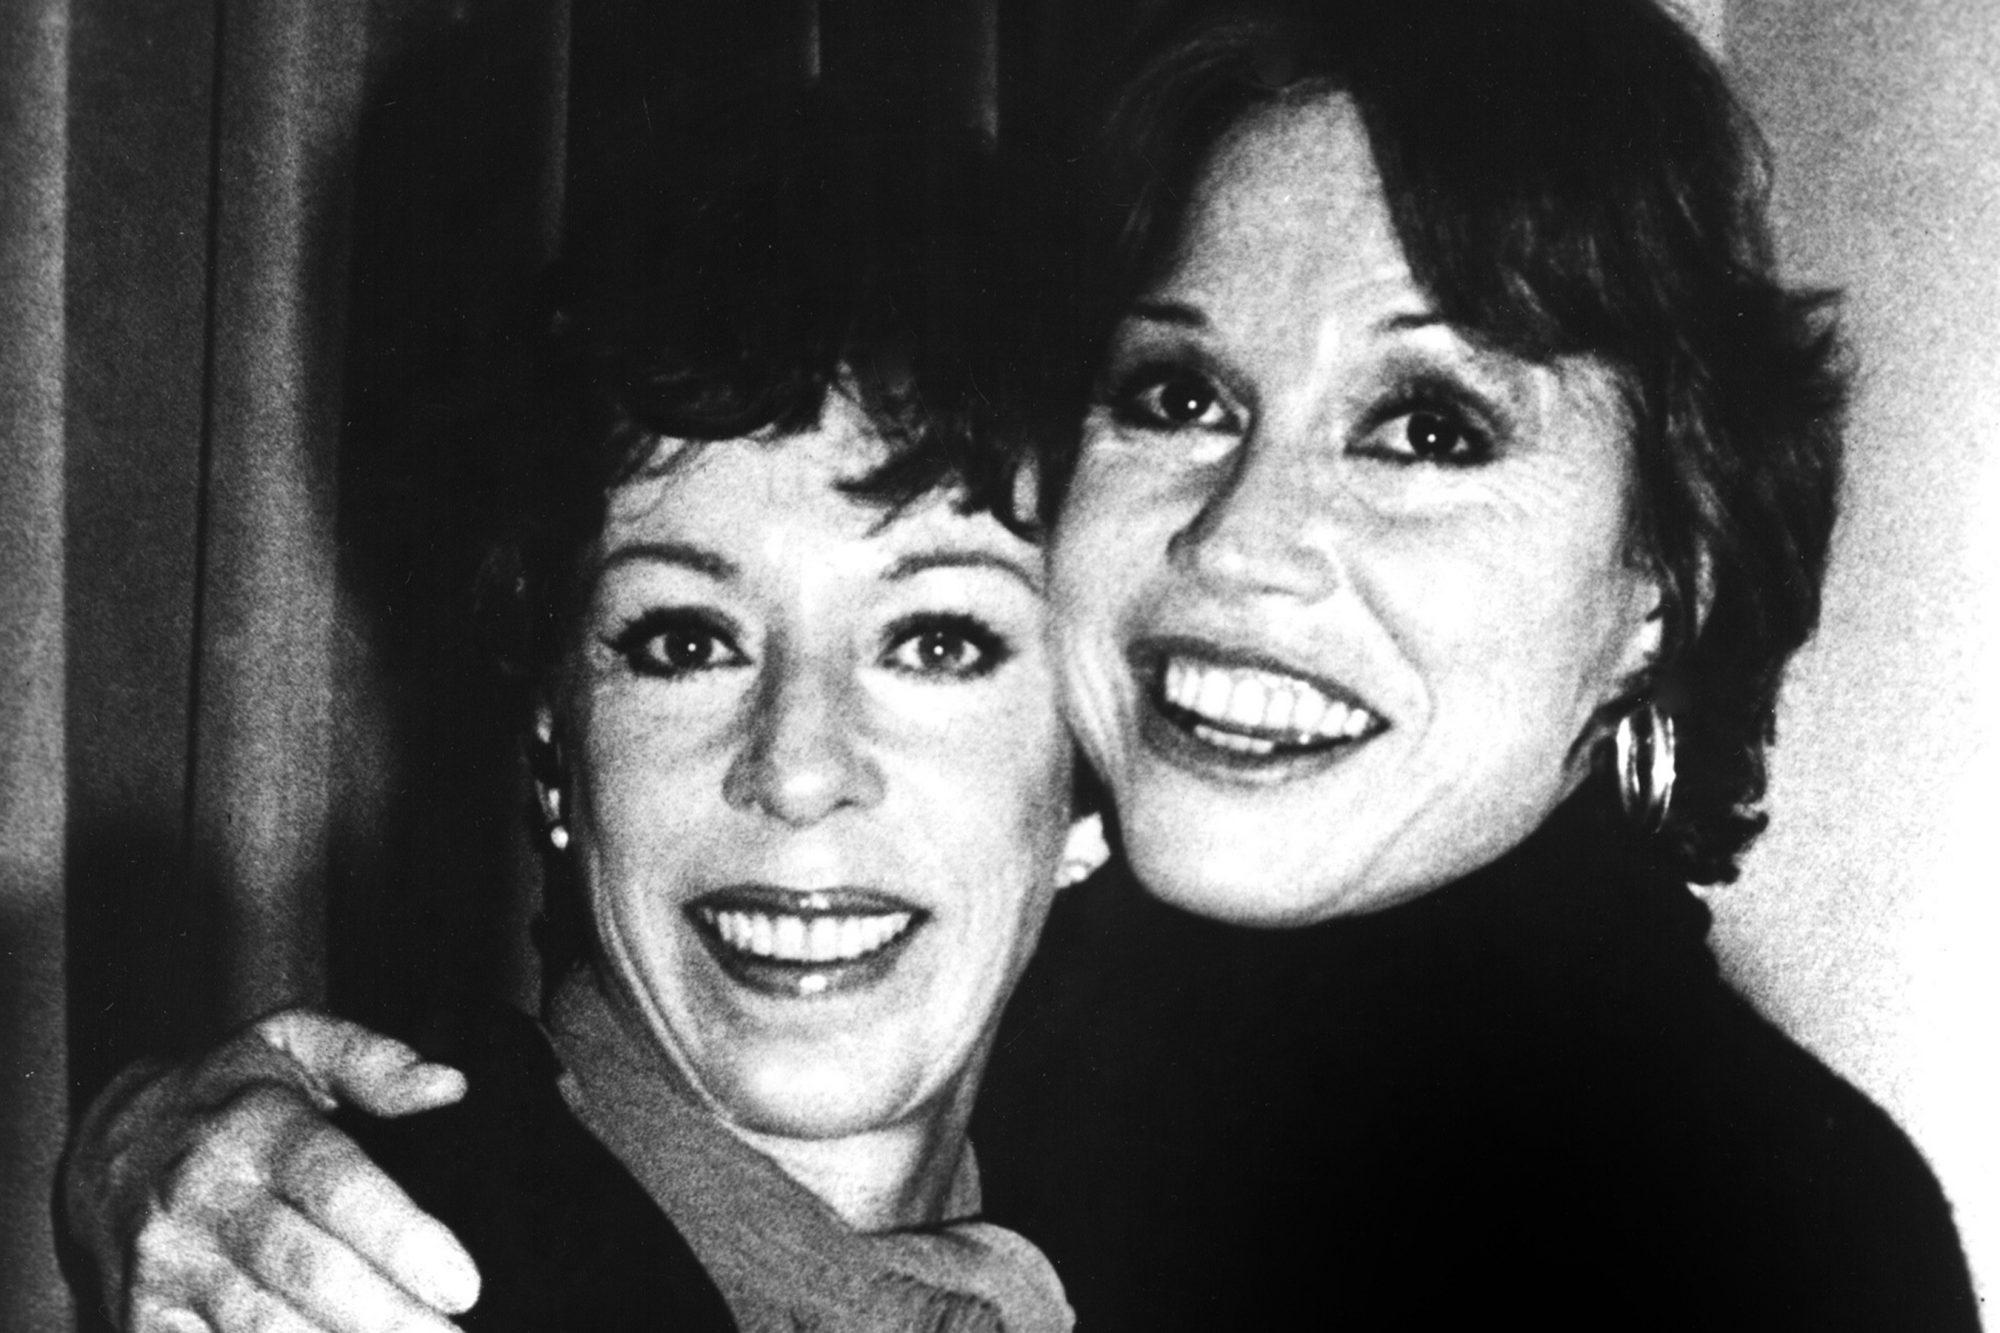 CAROL BURNETT, with Mary Tyler Moore